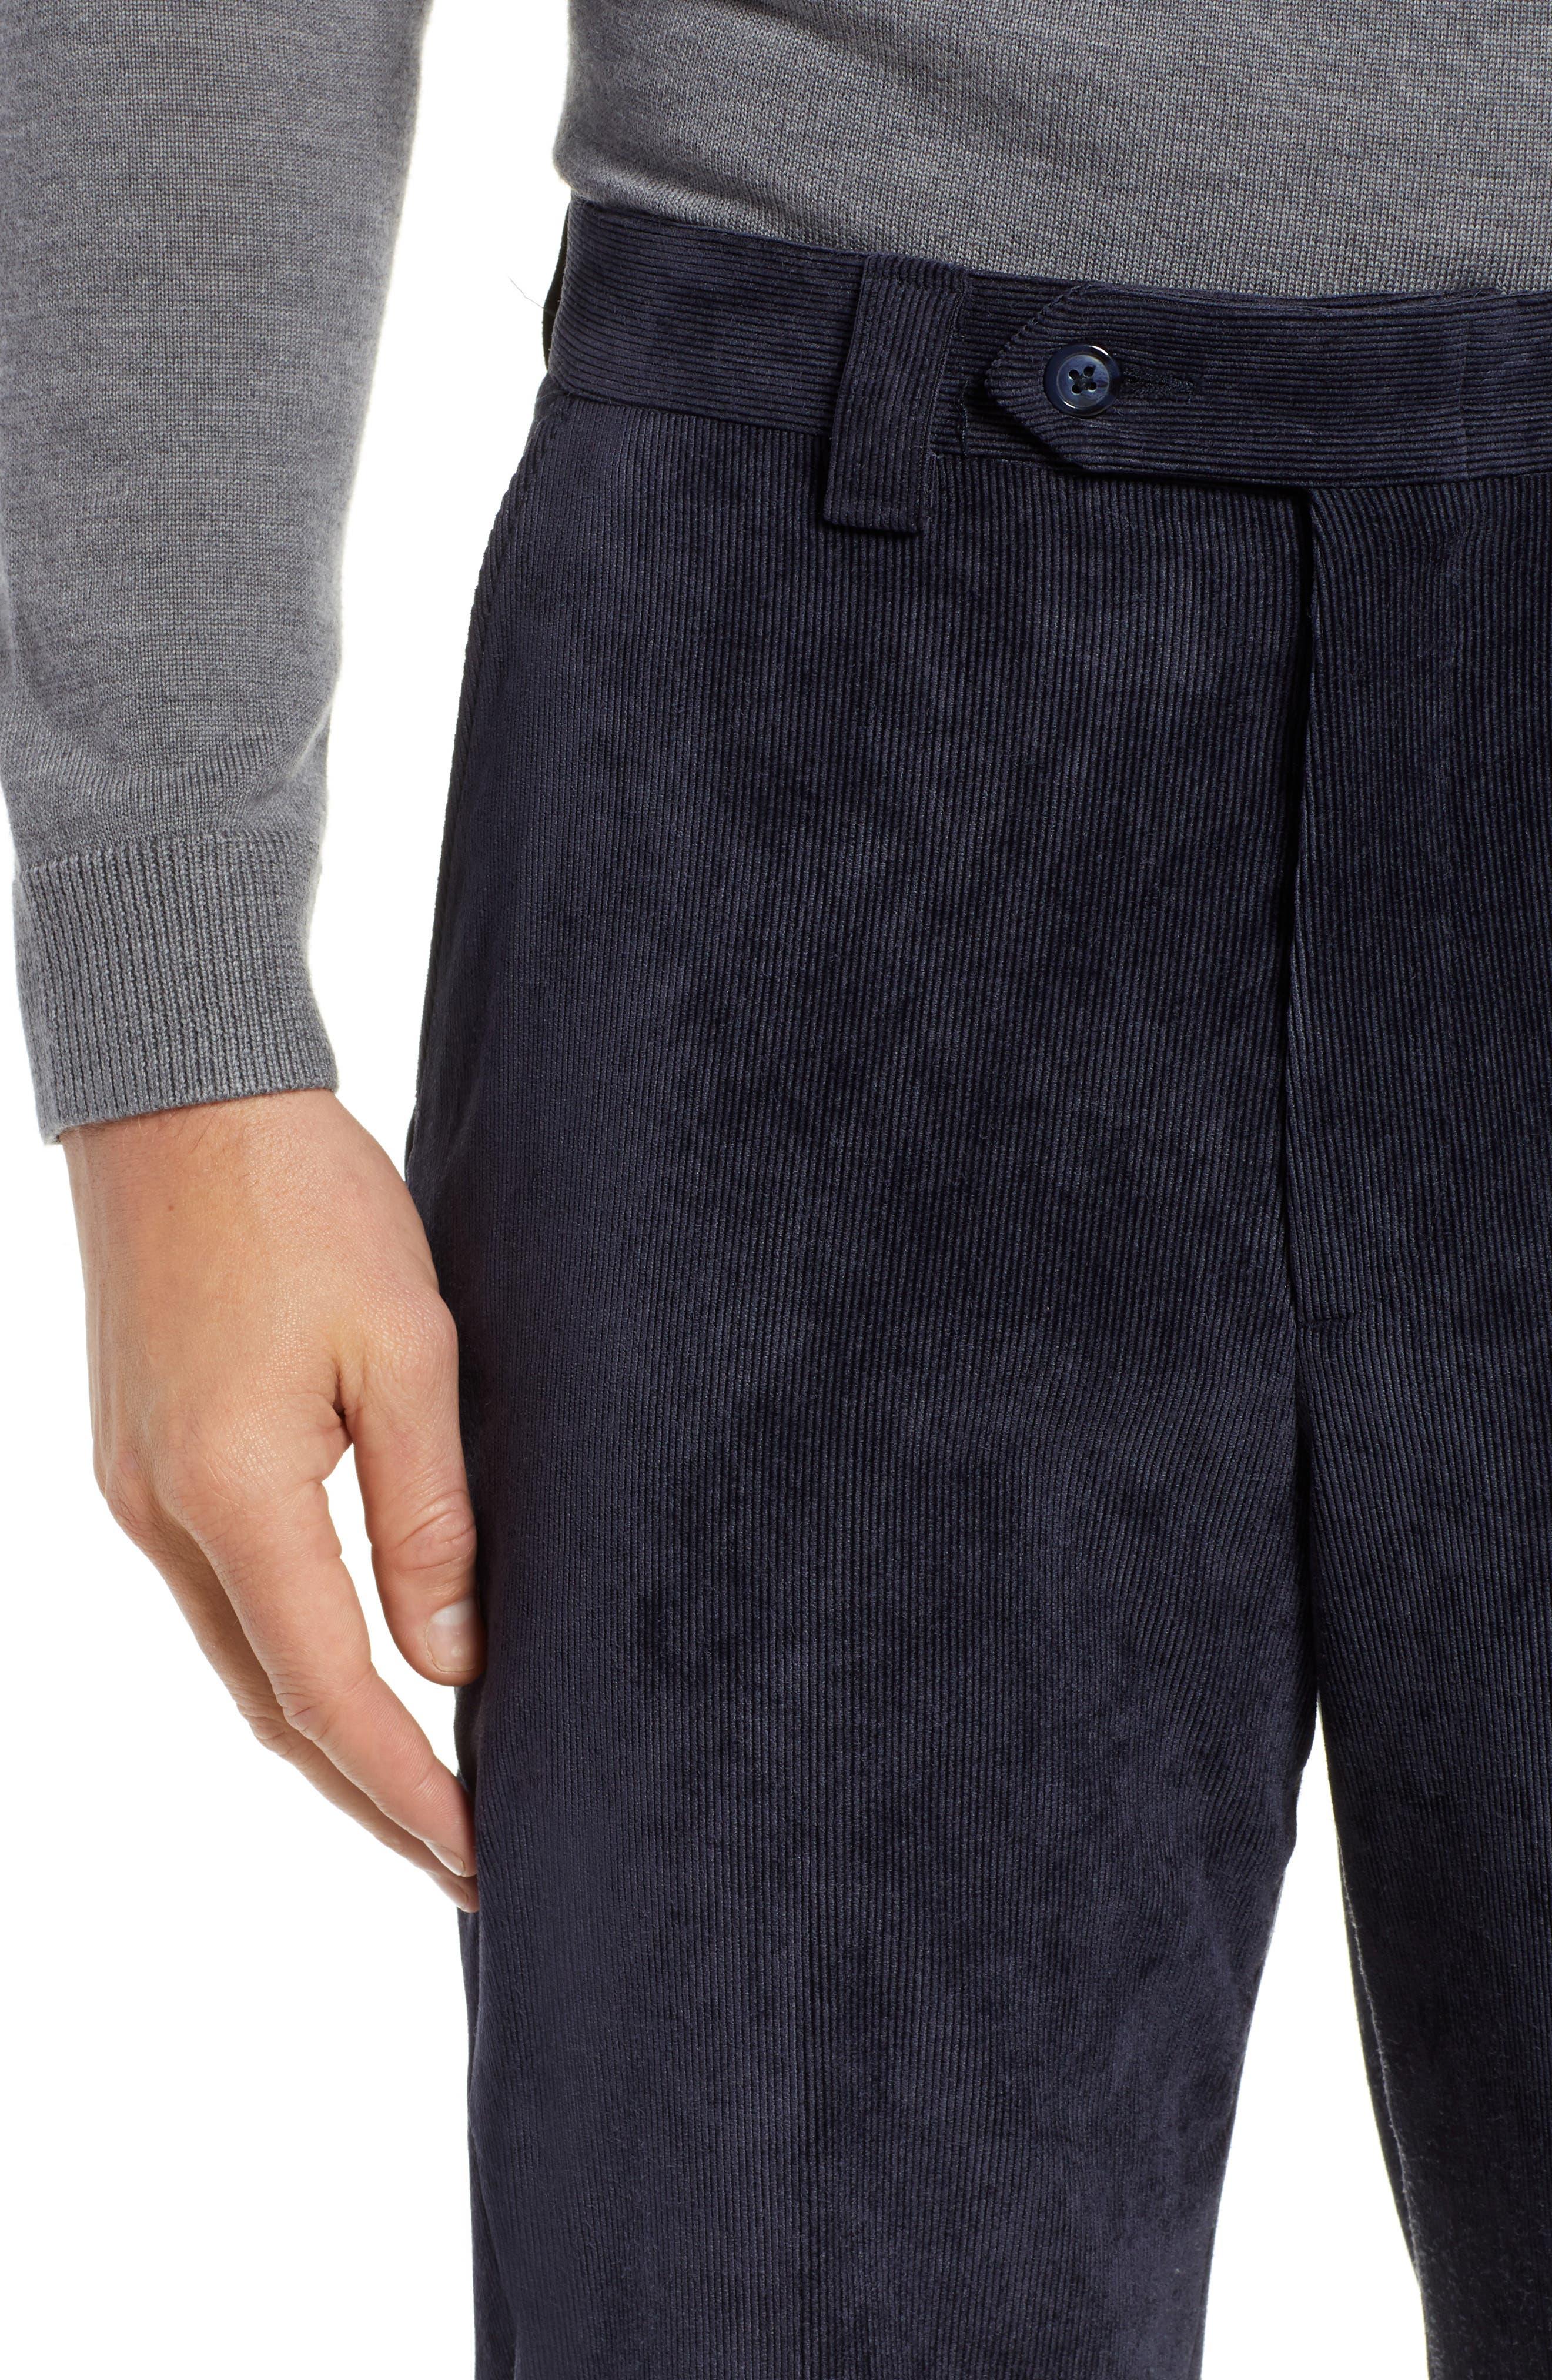 BERLE,                             Classic Fit Flat Front Corduroy Trousers,                             Alternate thumbnail 4, color,                             410